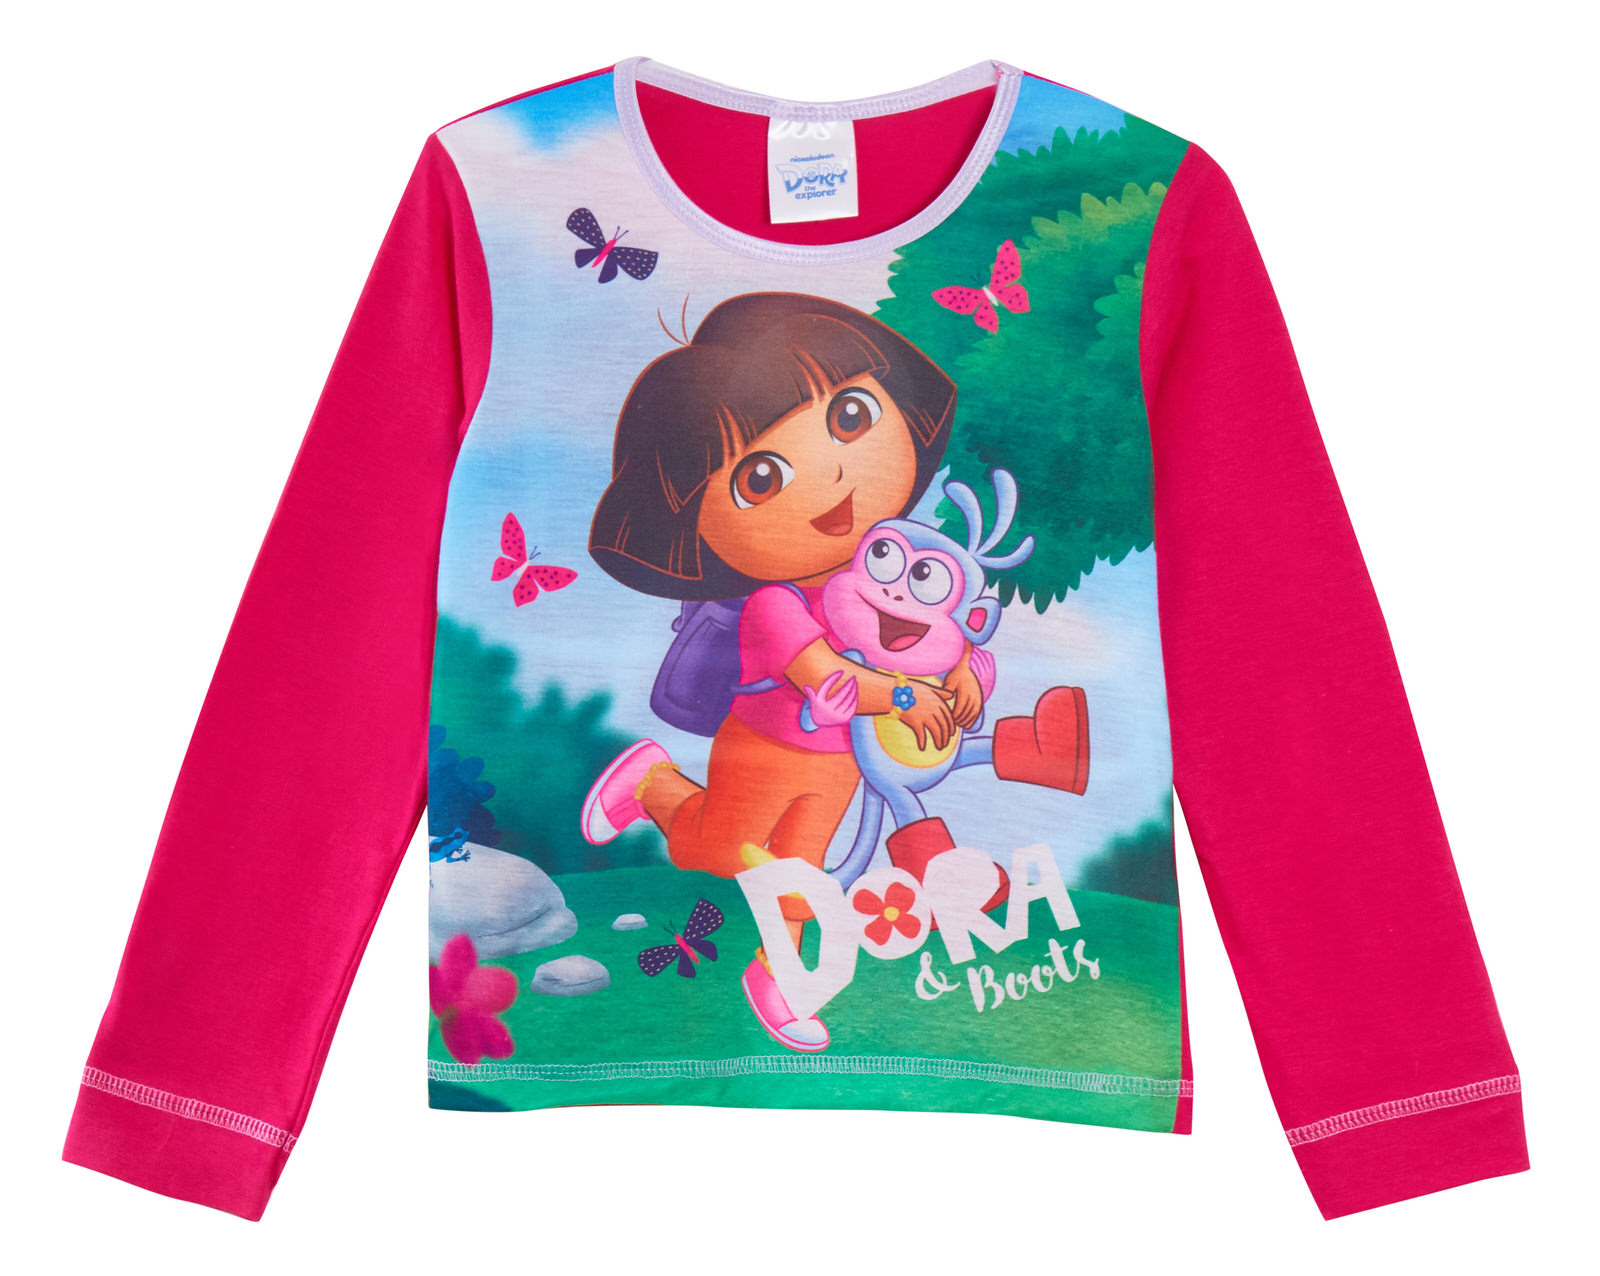 18 Months to 5 Years Dora The Explorer Infant Girls Pyjamas Various Designs